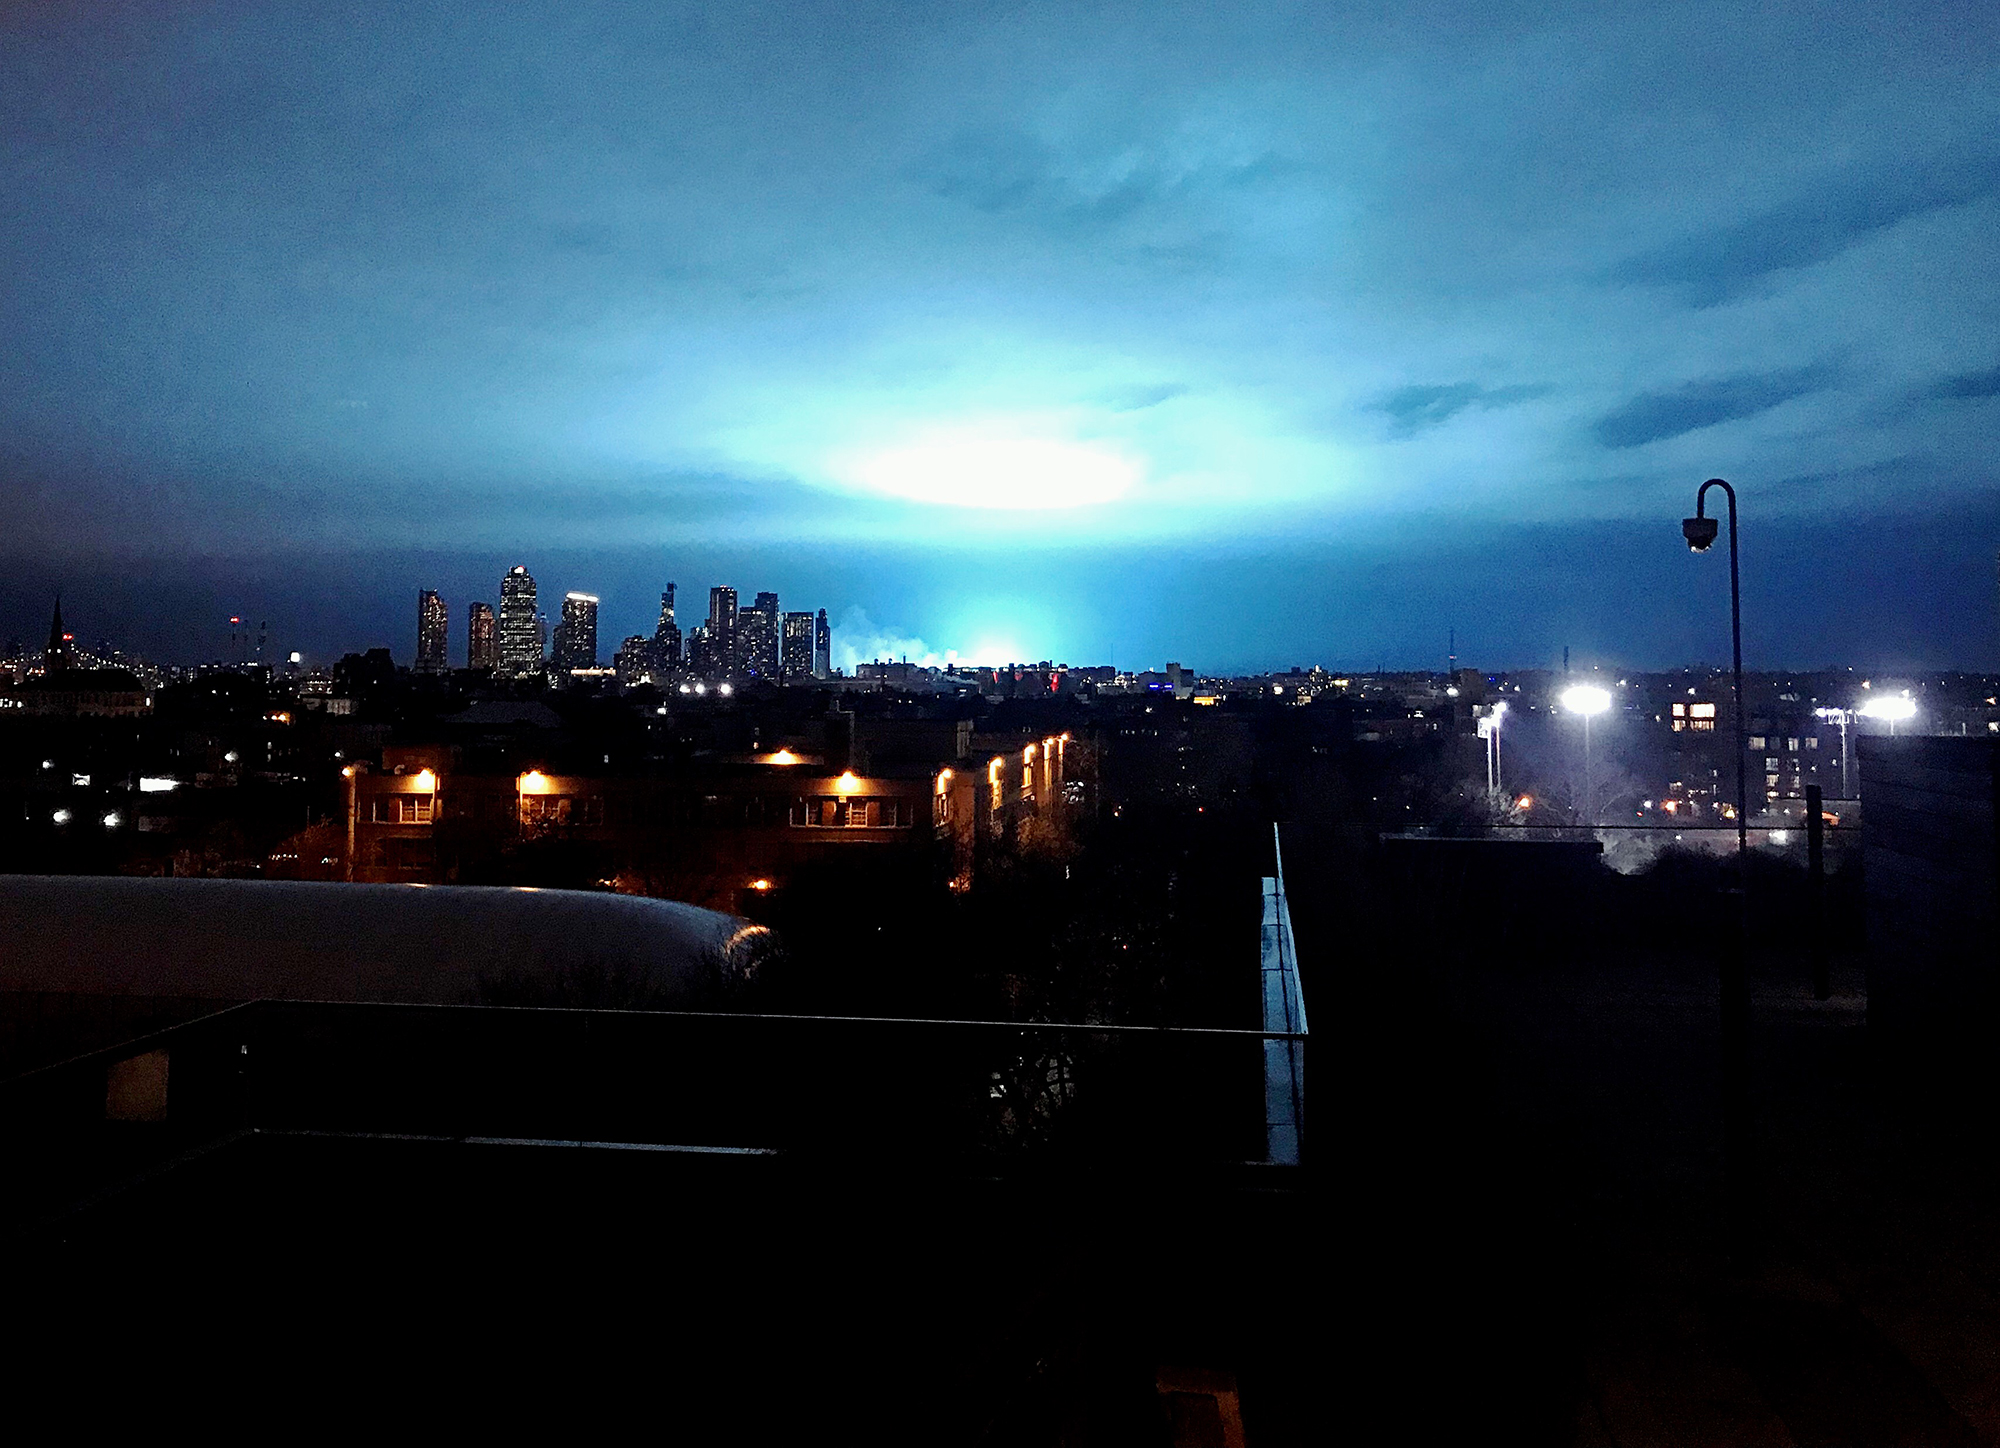 Celebs Freak Out Over Eerie Blue Light New York City Transformer Explosion